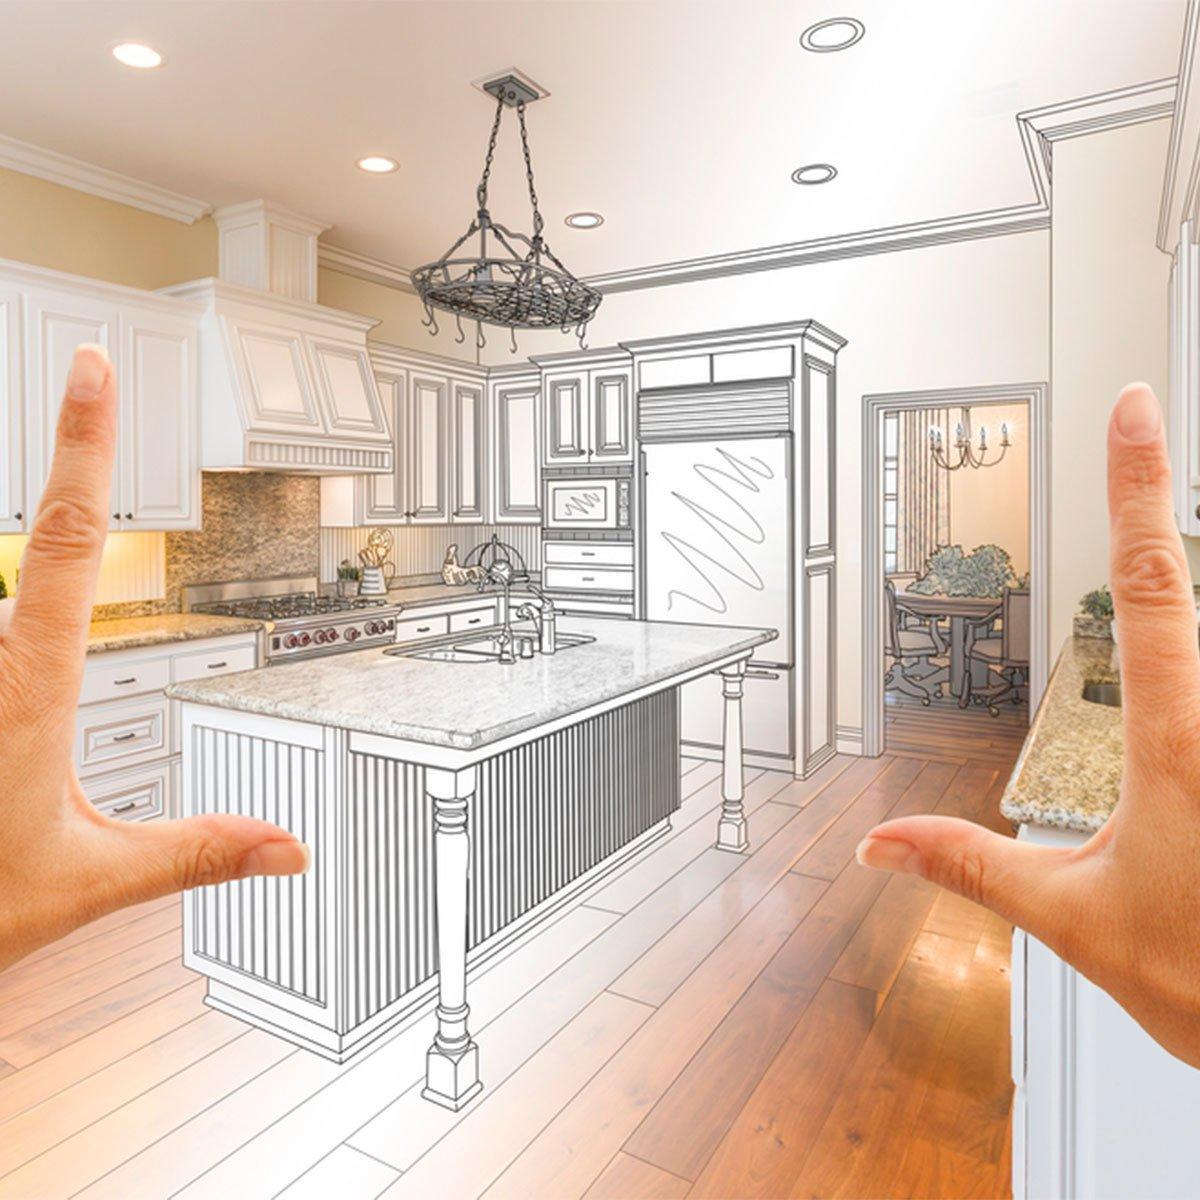 Bonus Home Renovation Tips